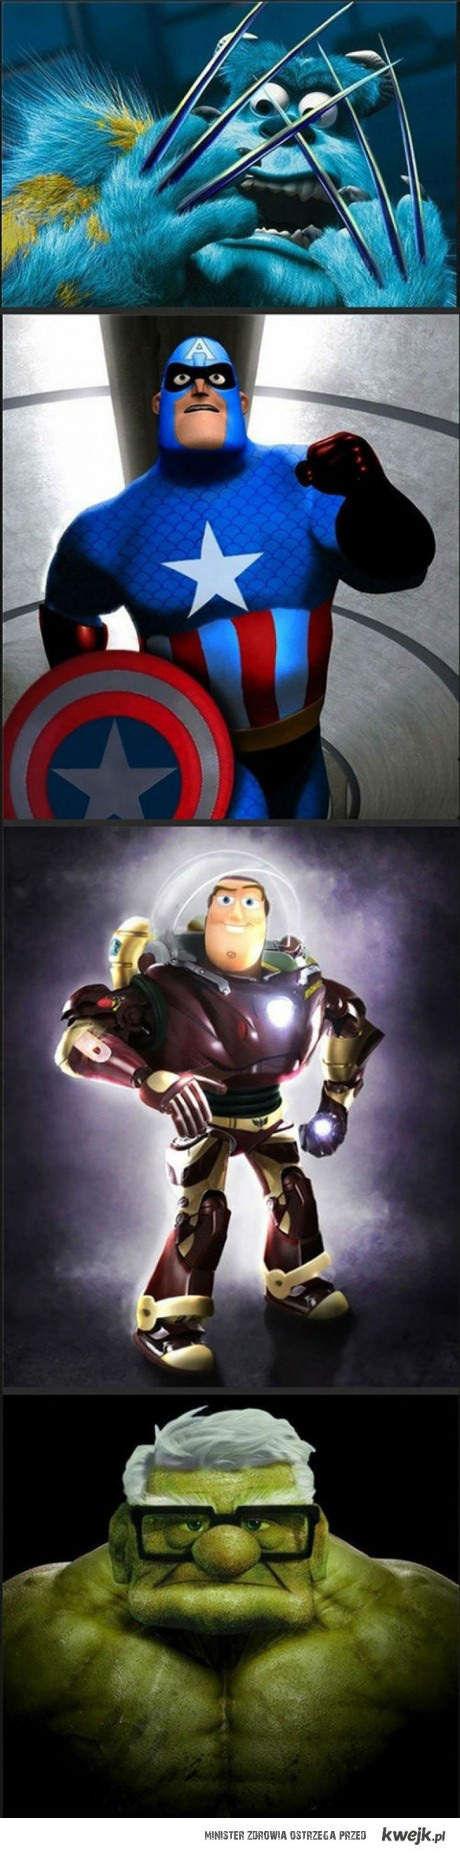 Pixar avengers